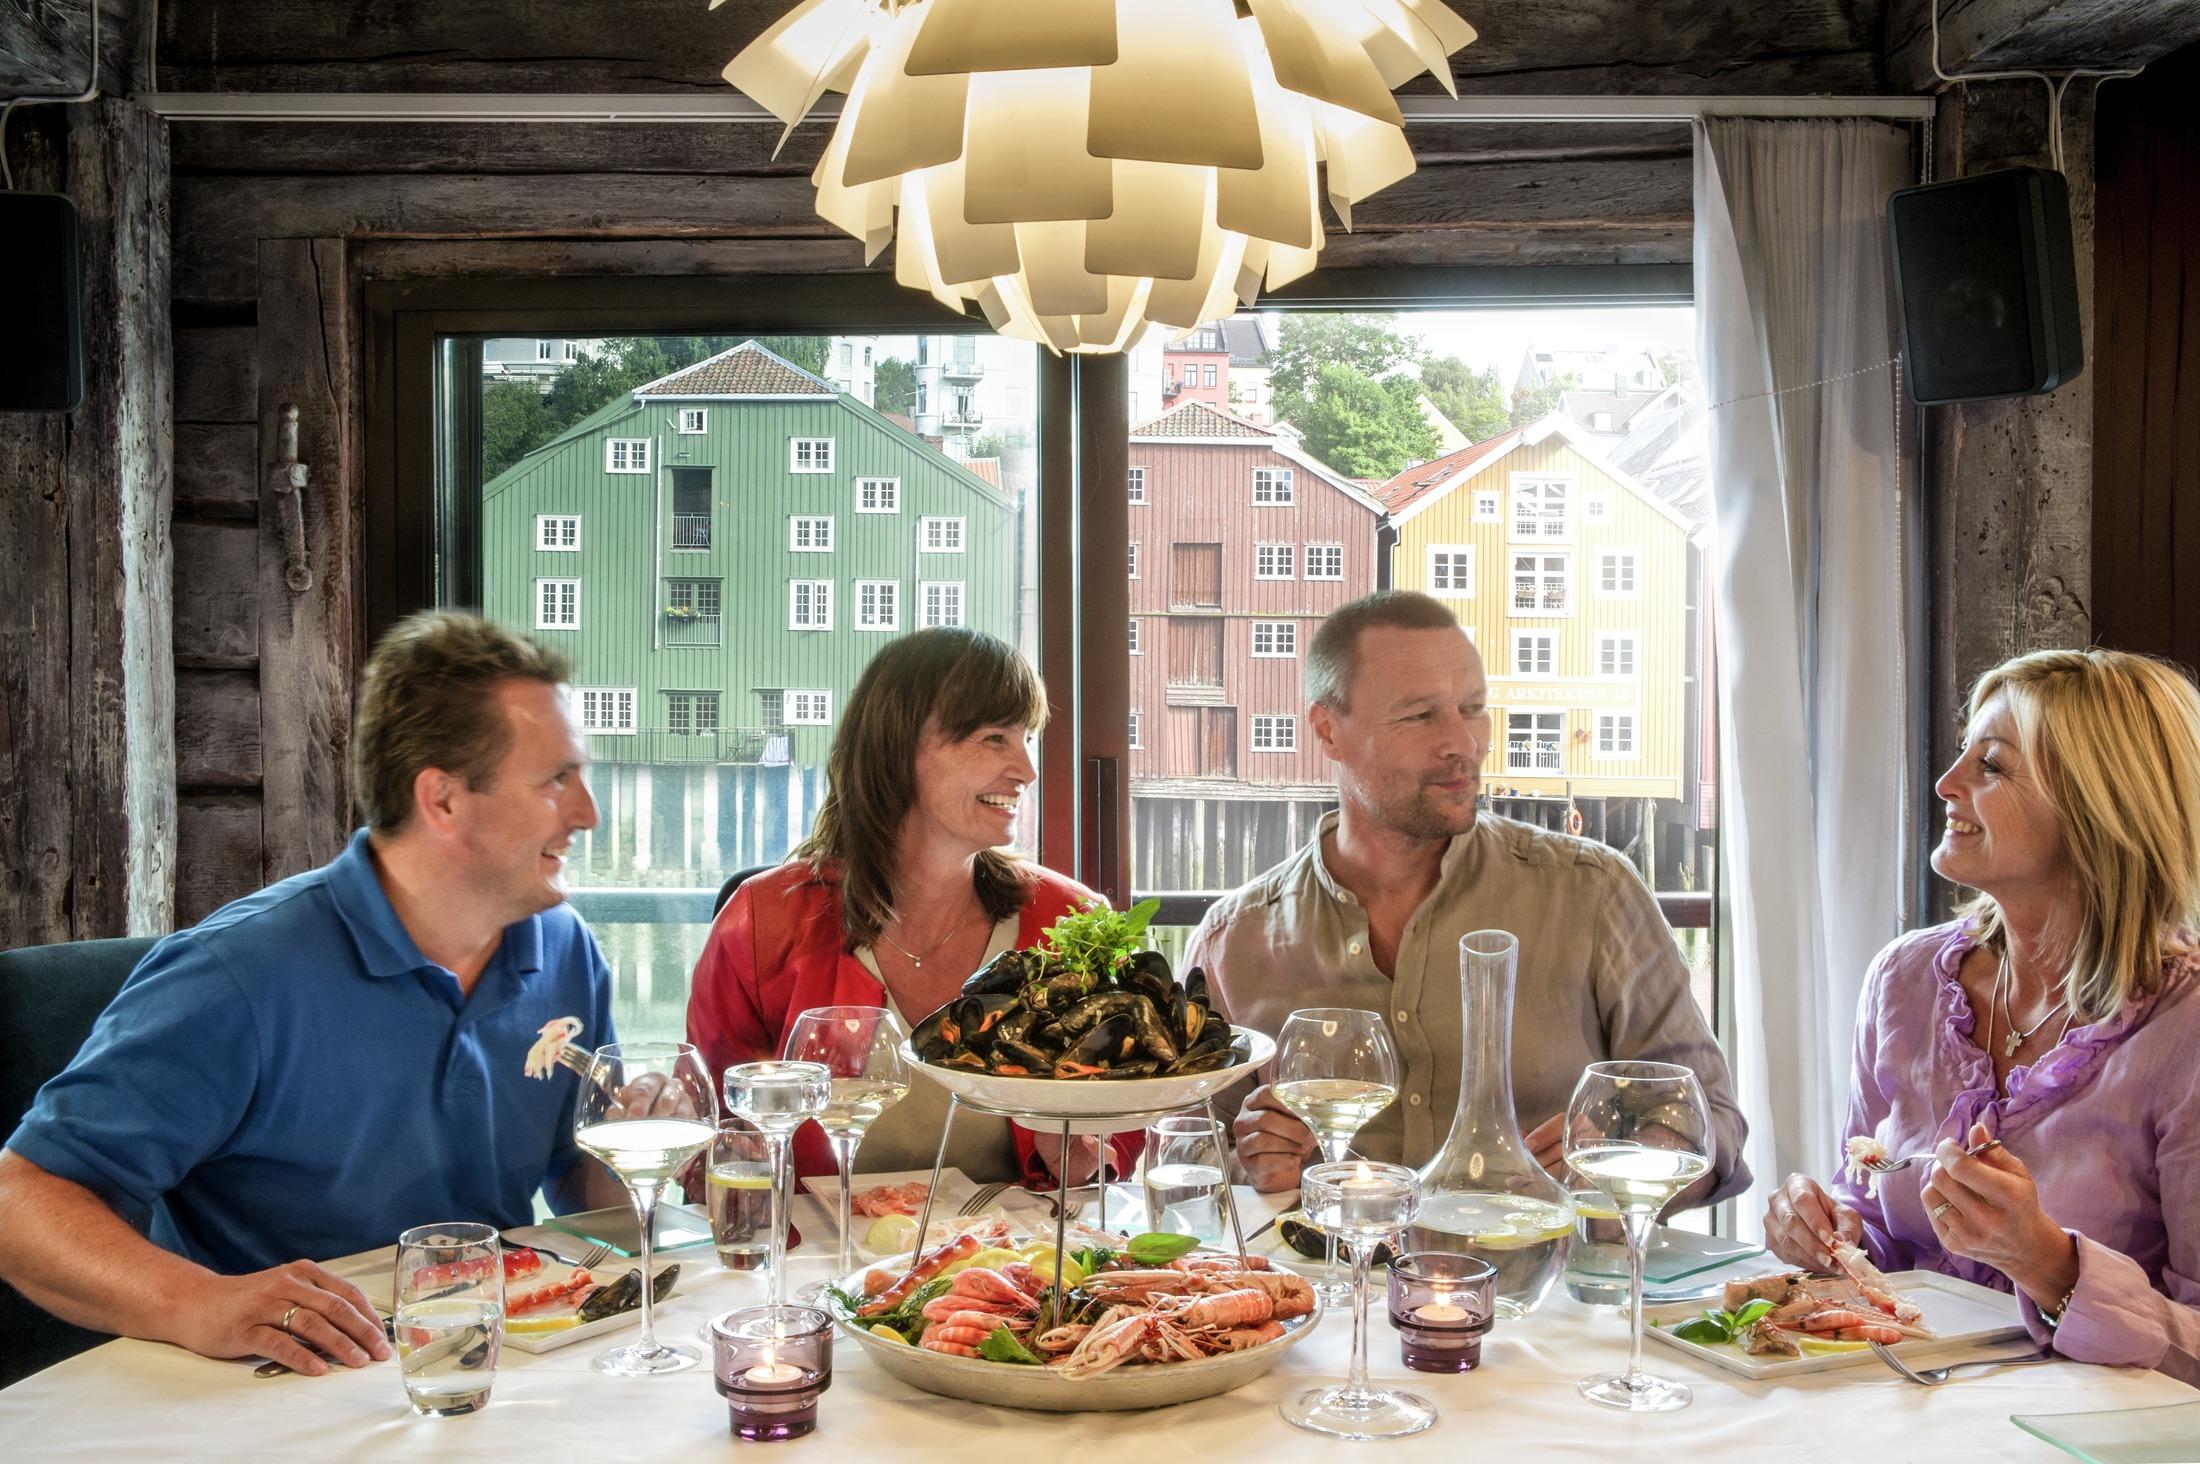 havfruen restaurant trondheim Florø